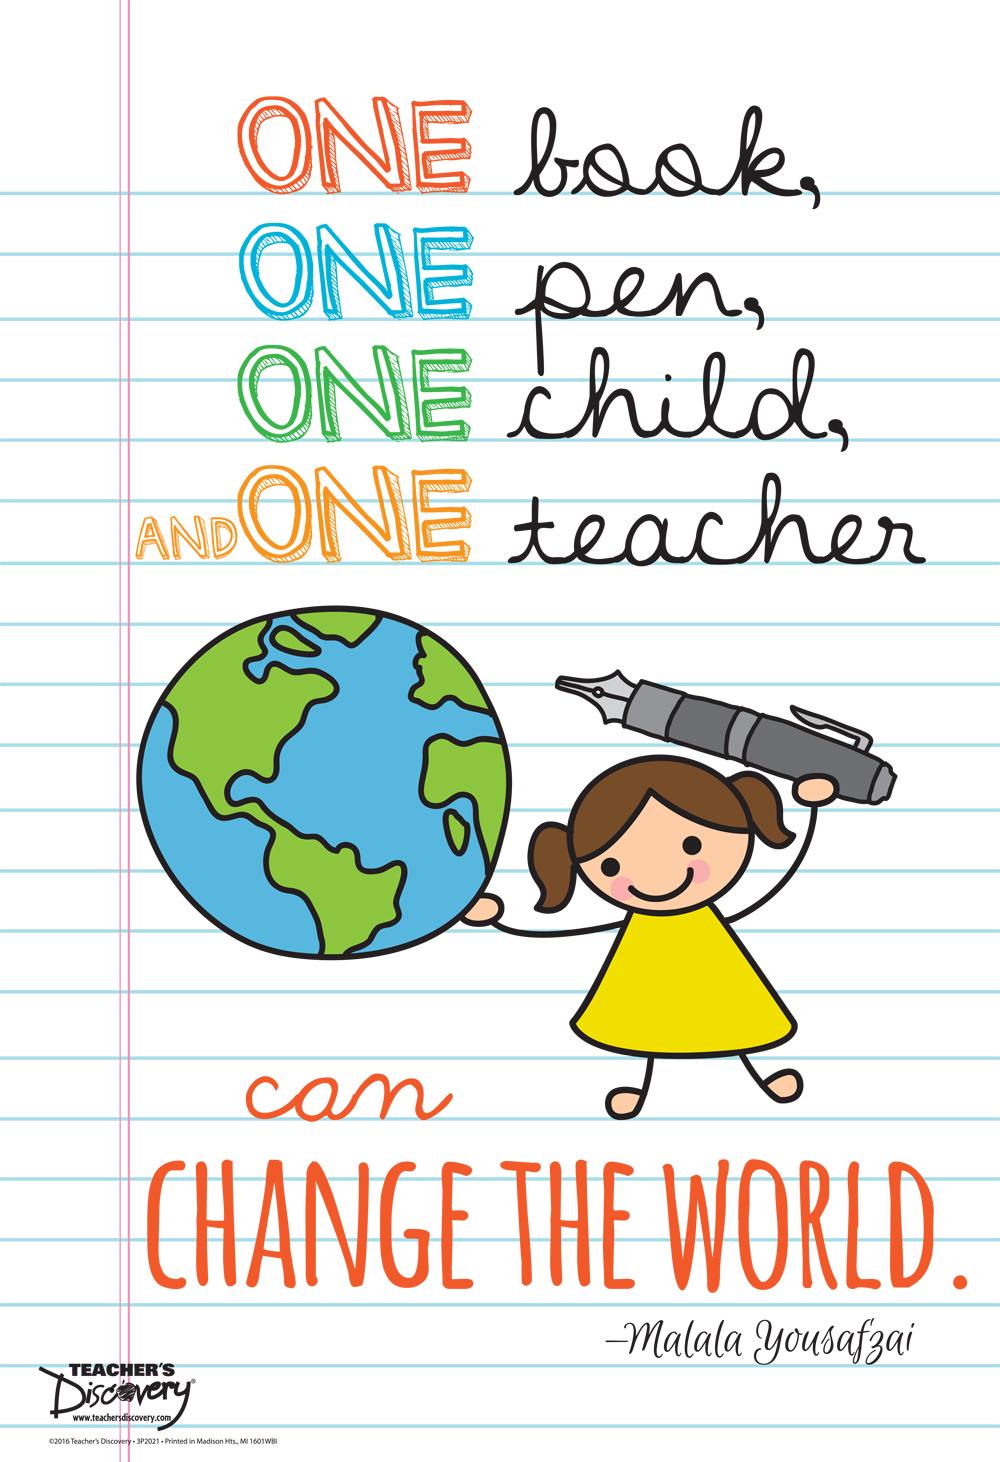 Malala on Education Mini-Poster